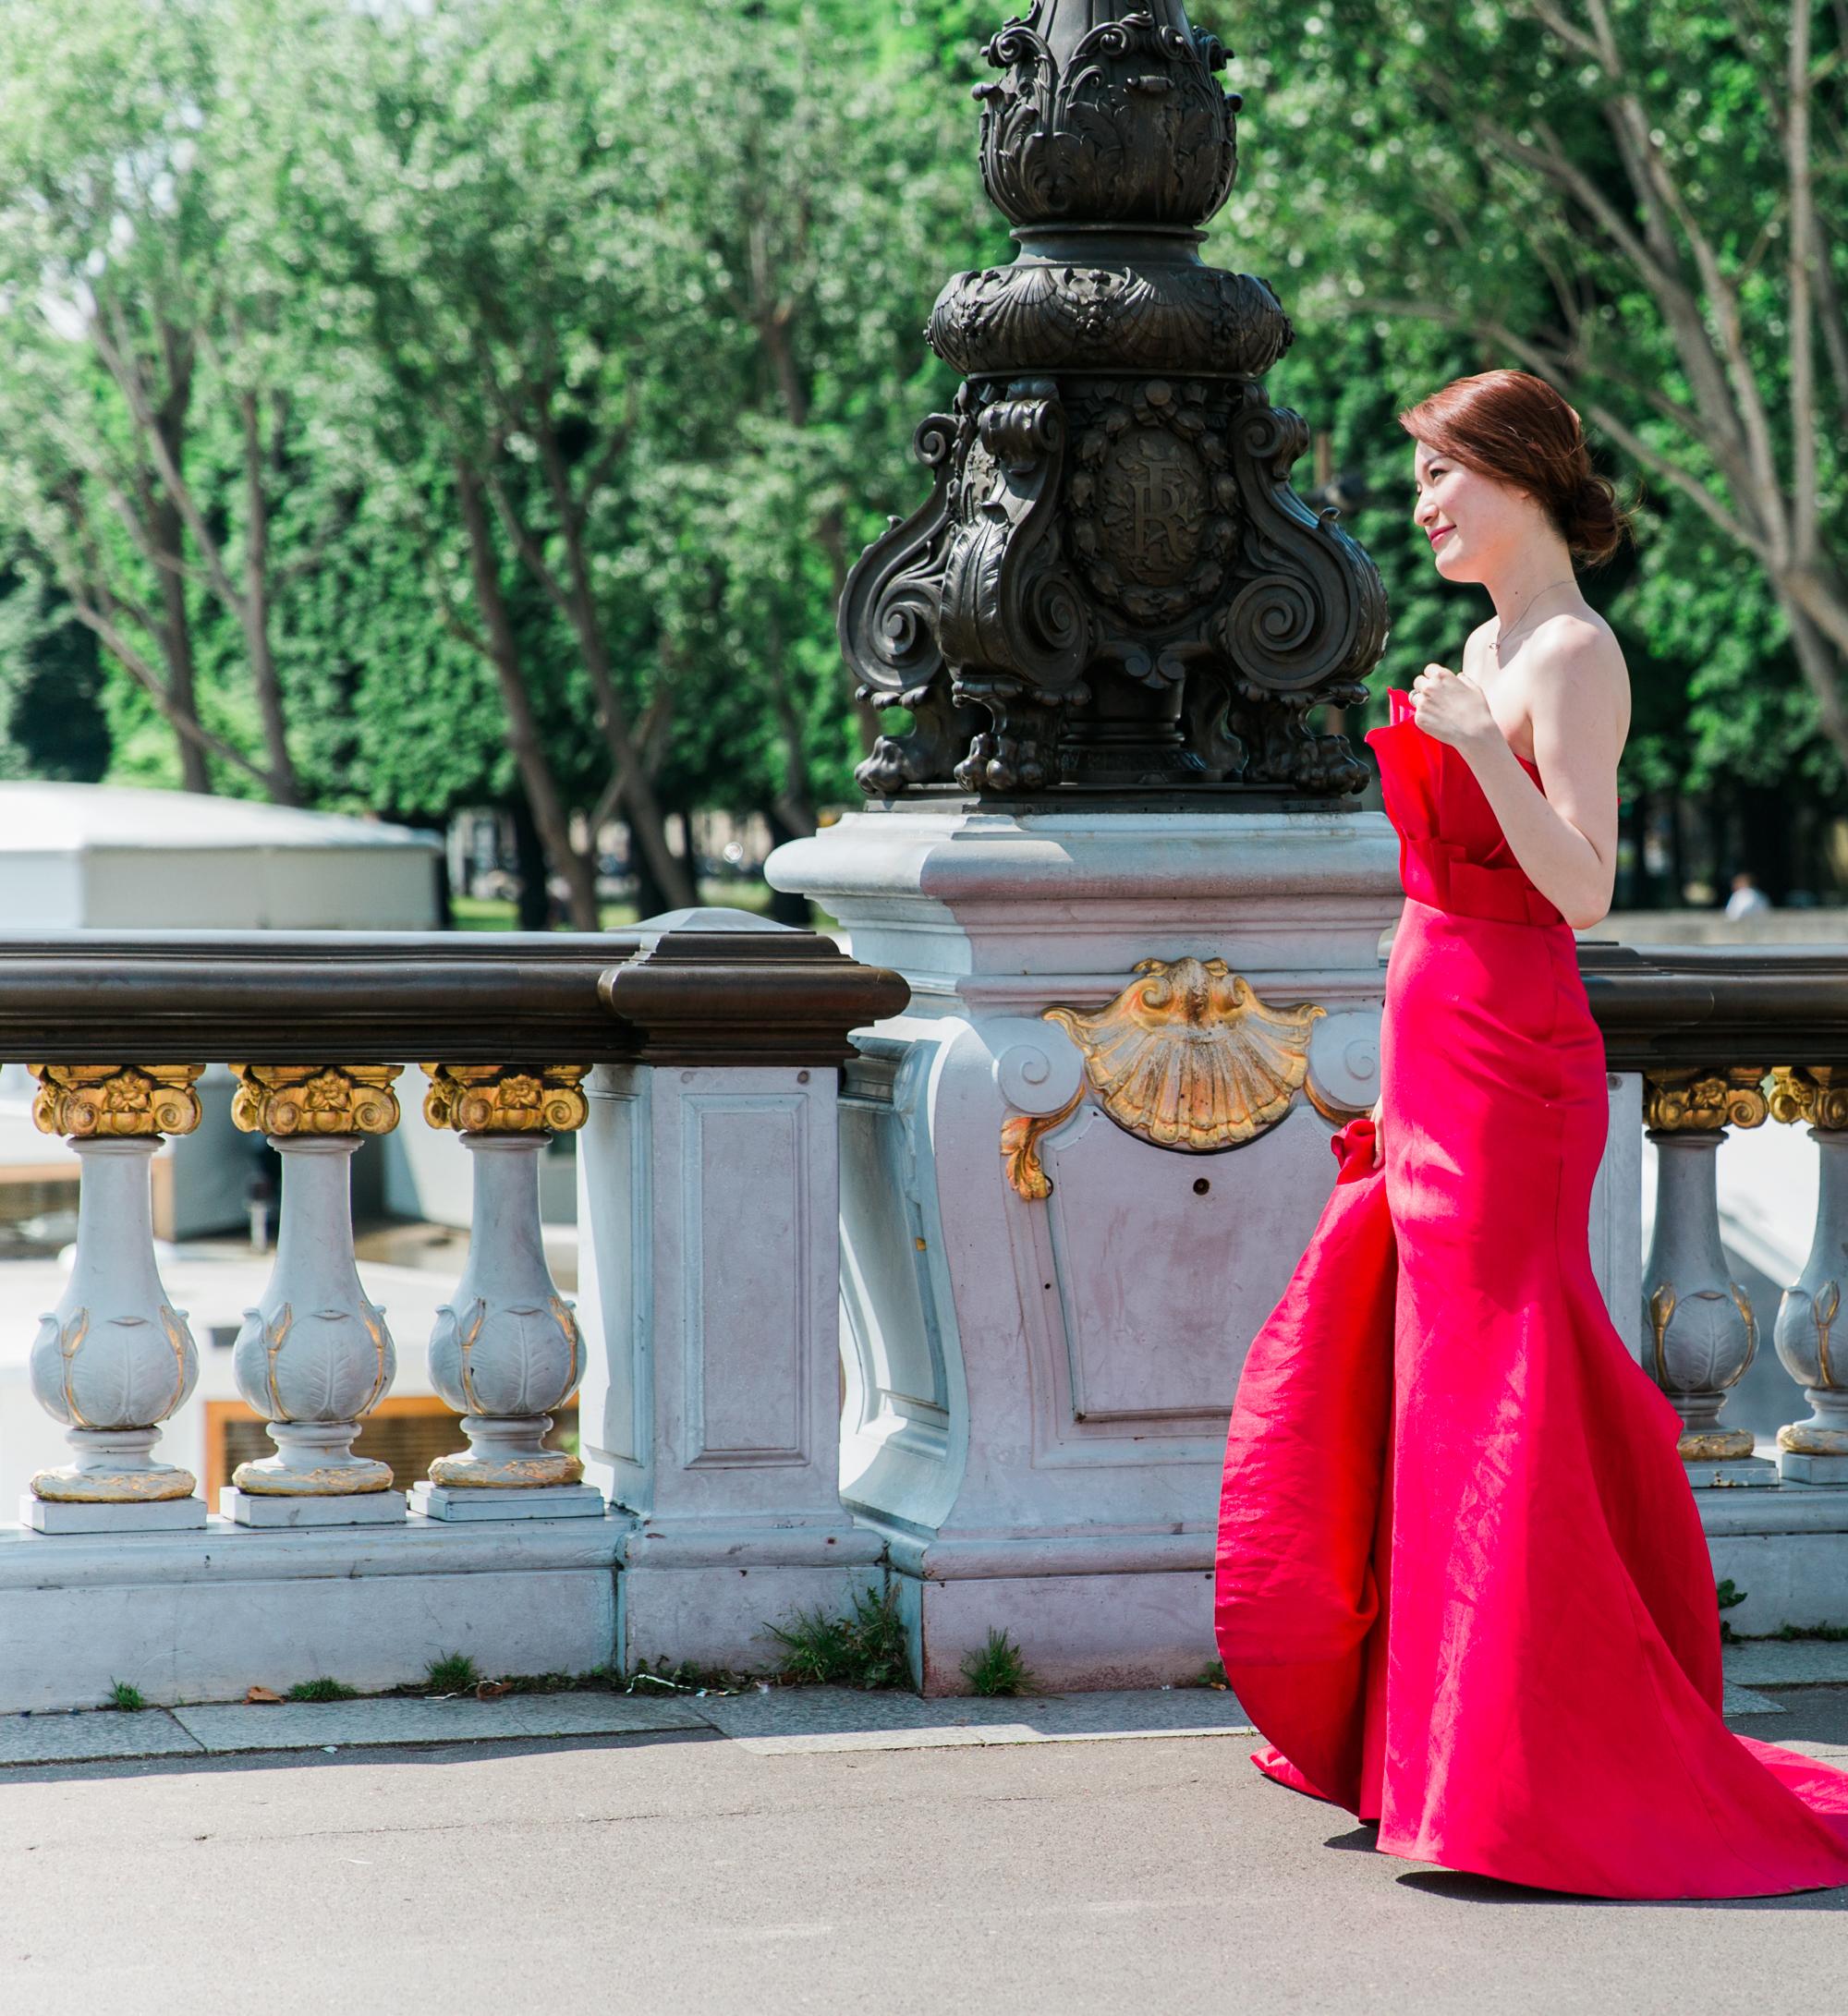 Paris Wedding Photographer Bonphotage